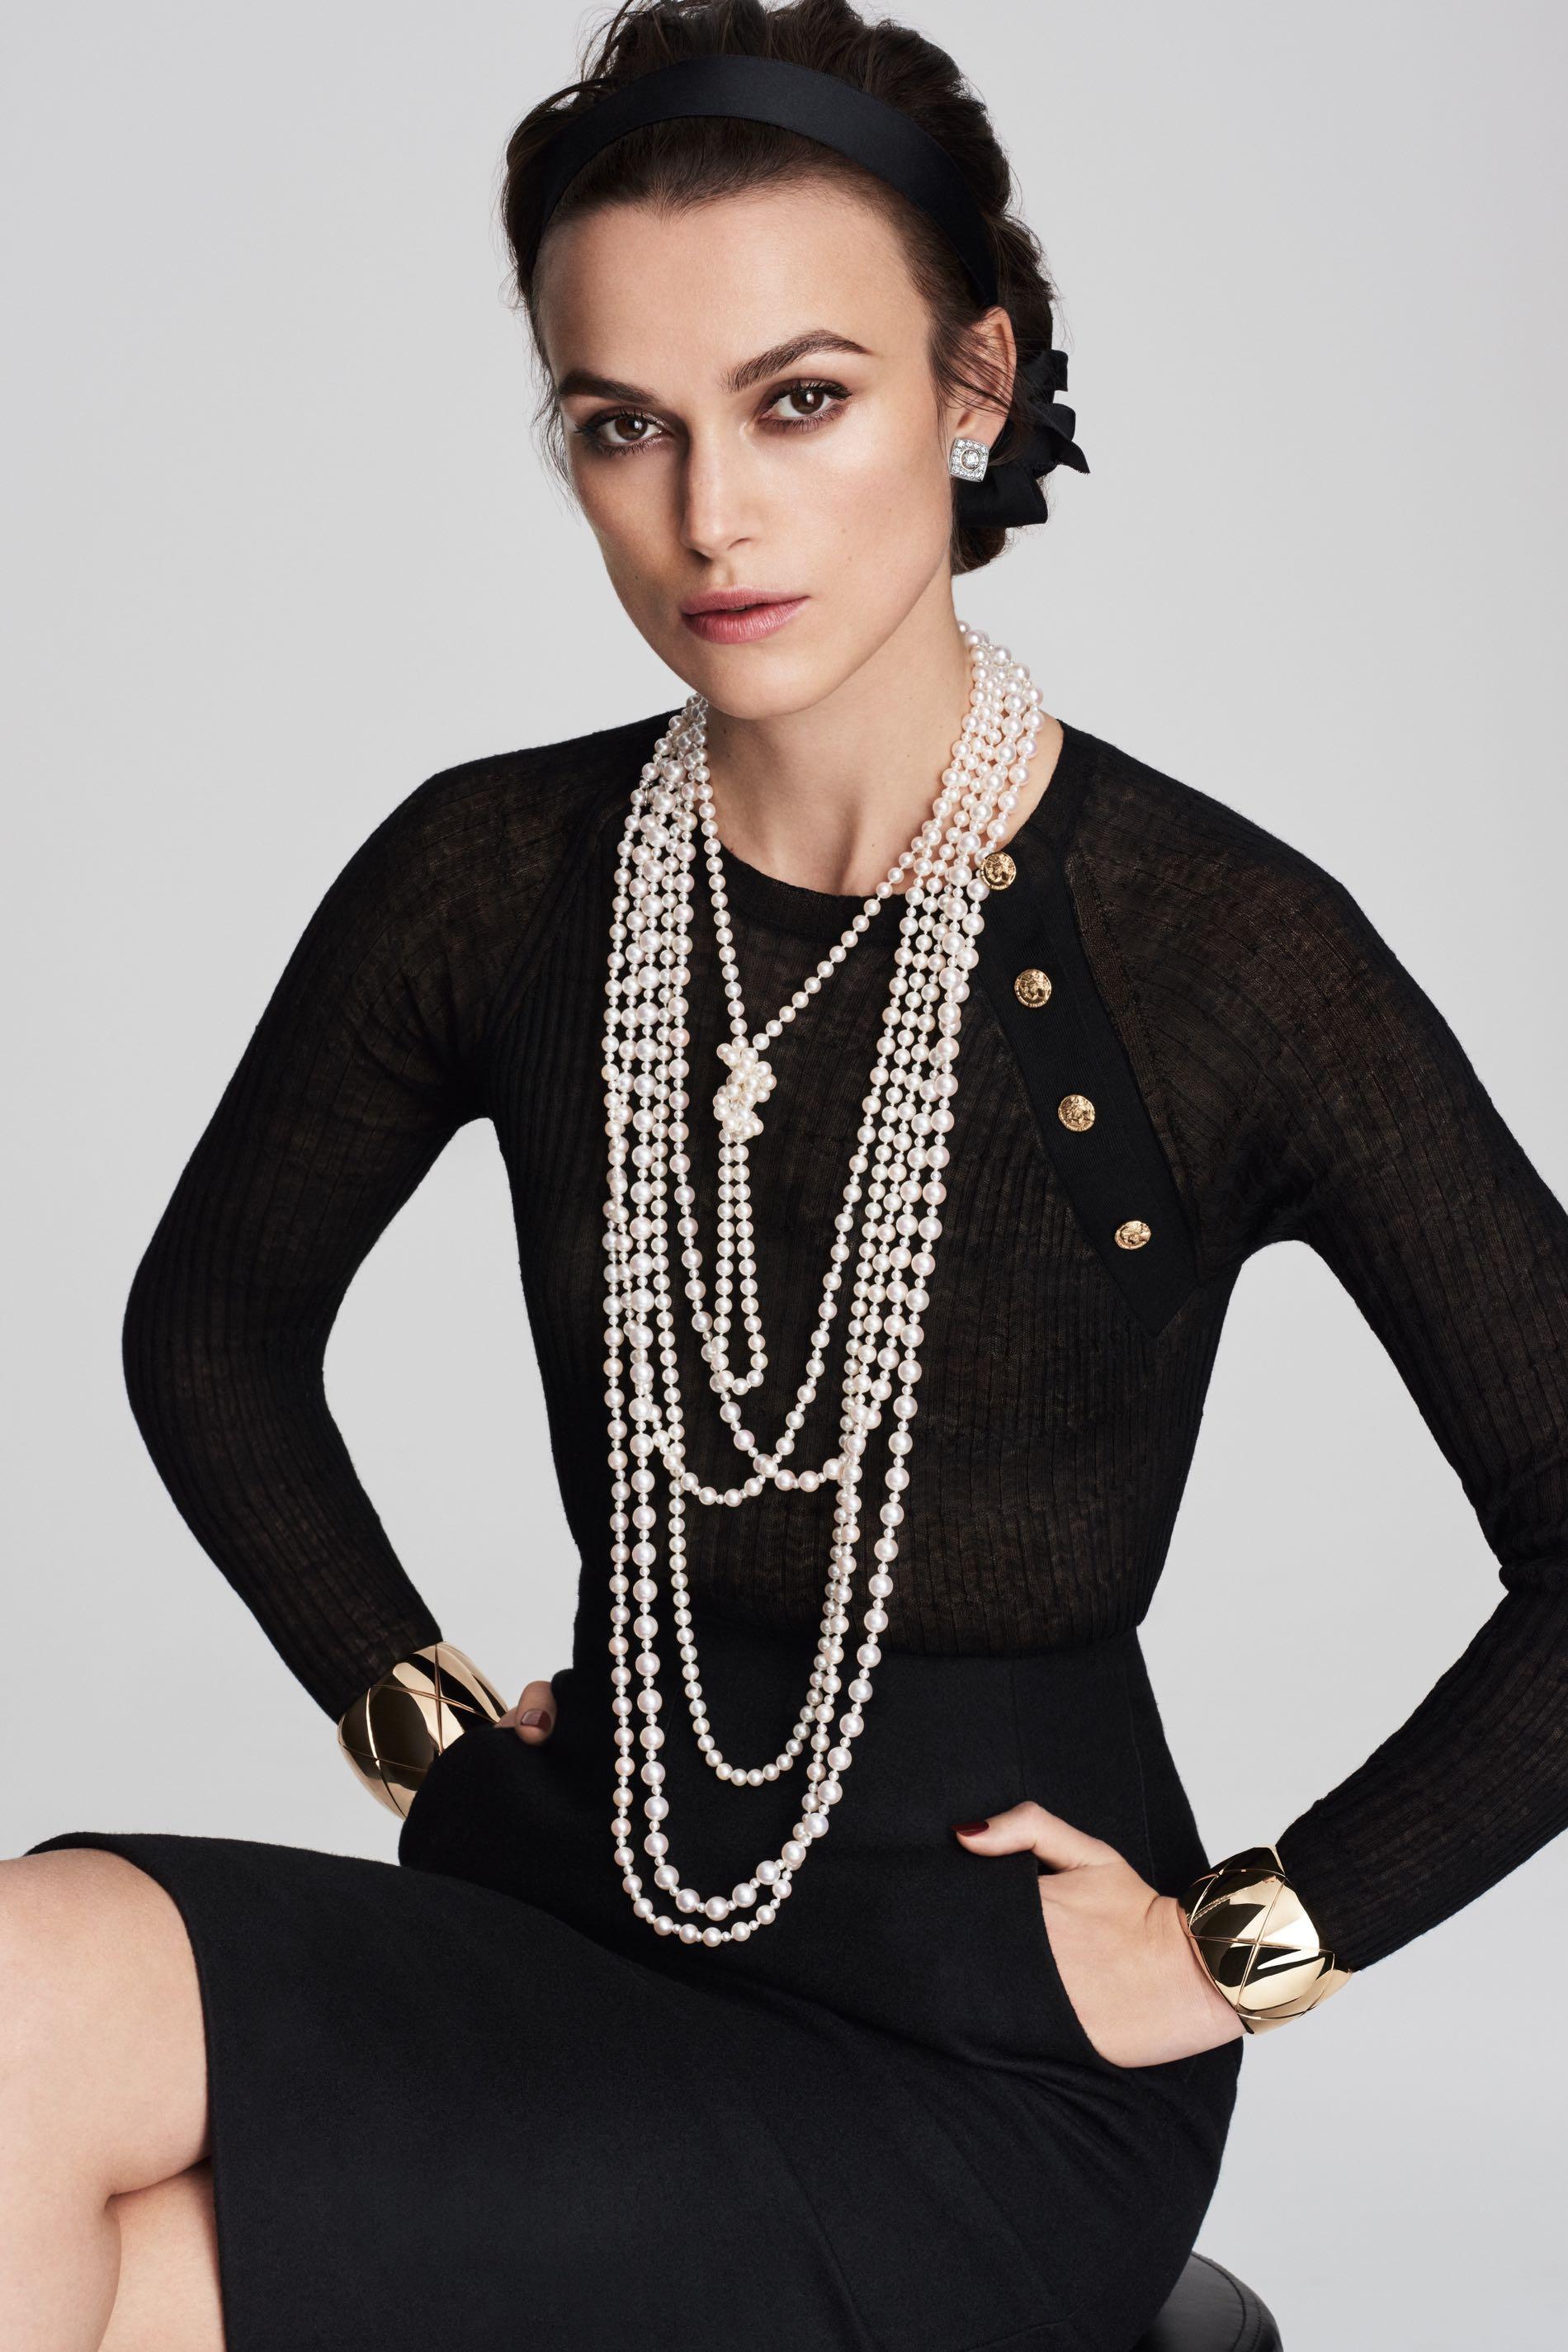 Keira Knightley Chanel Coco Crush3